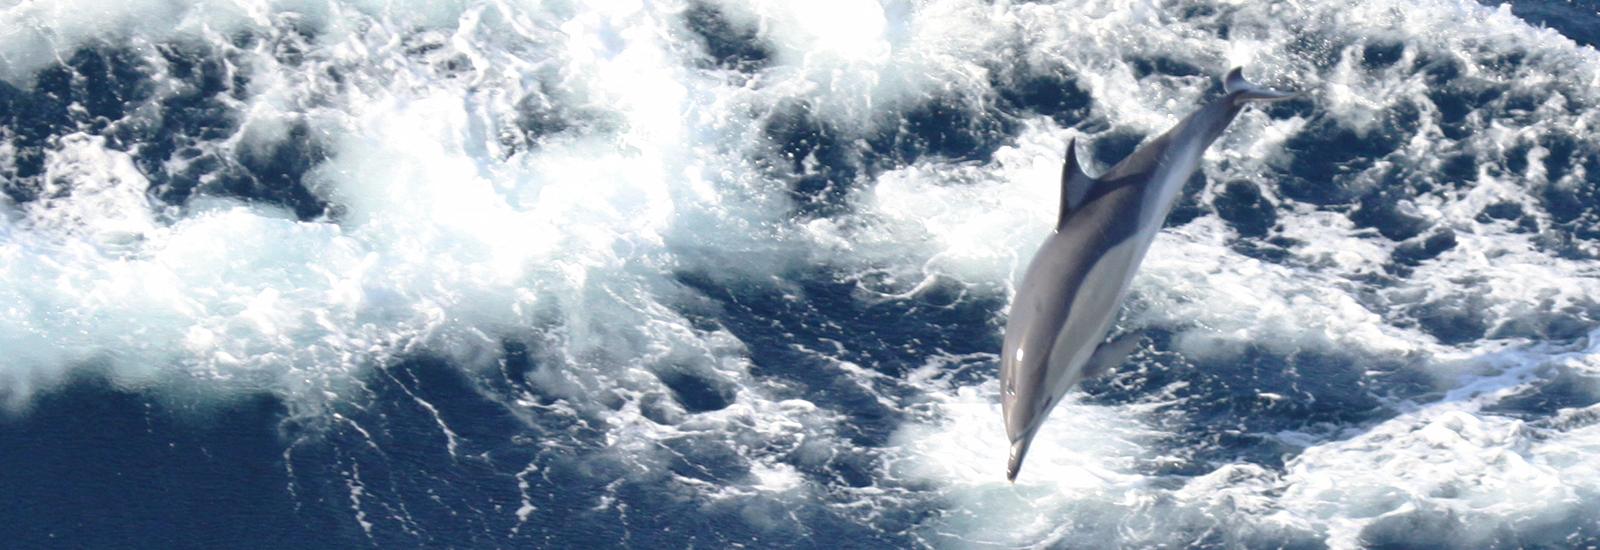 dolphin mammifere marin sismique industrie